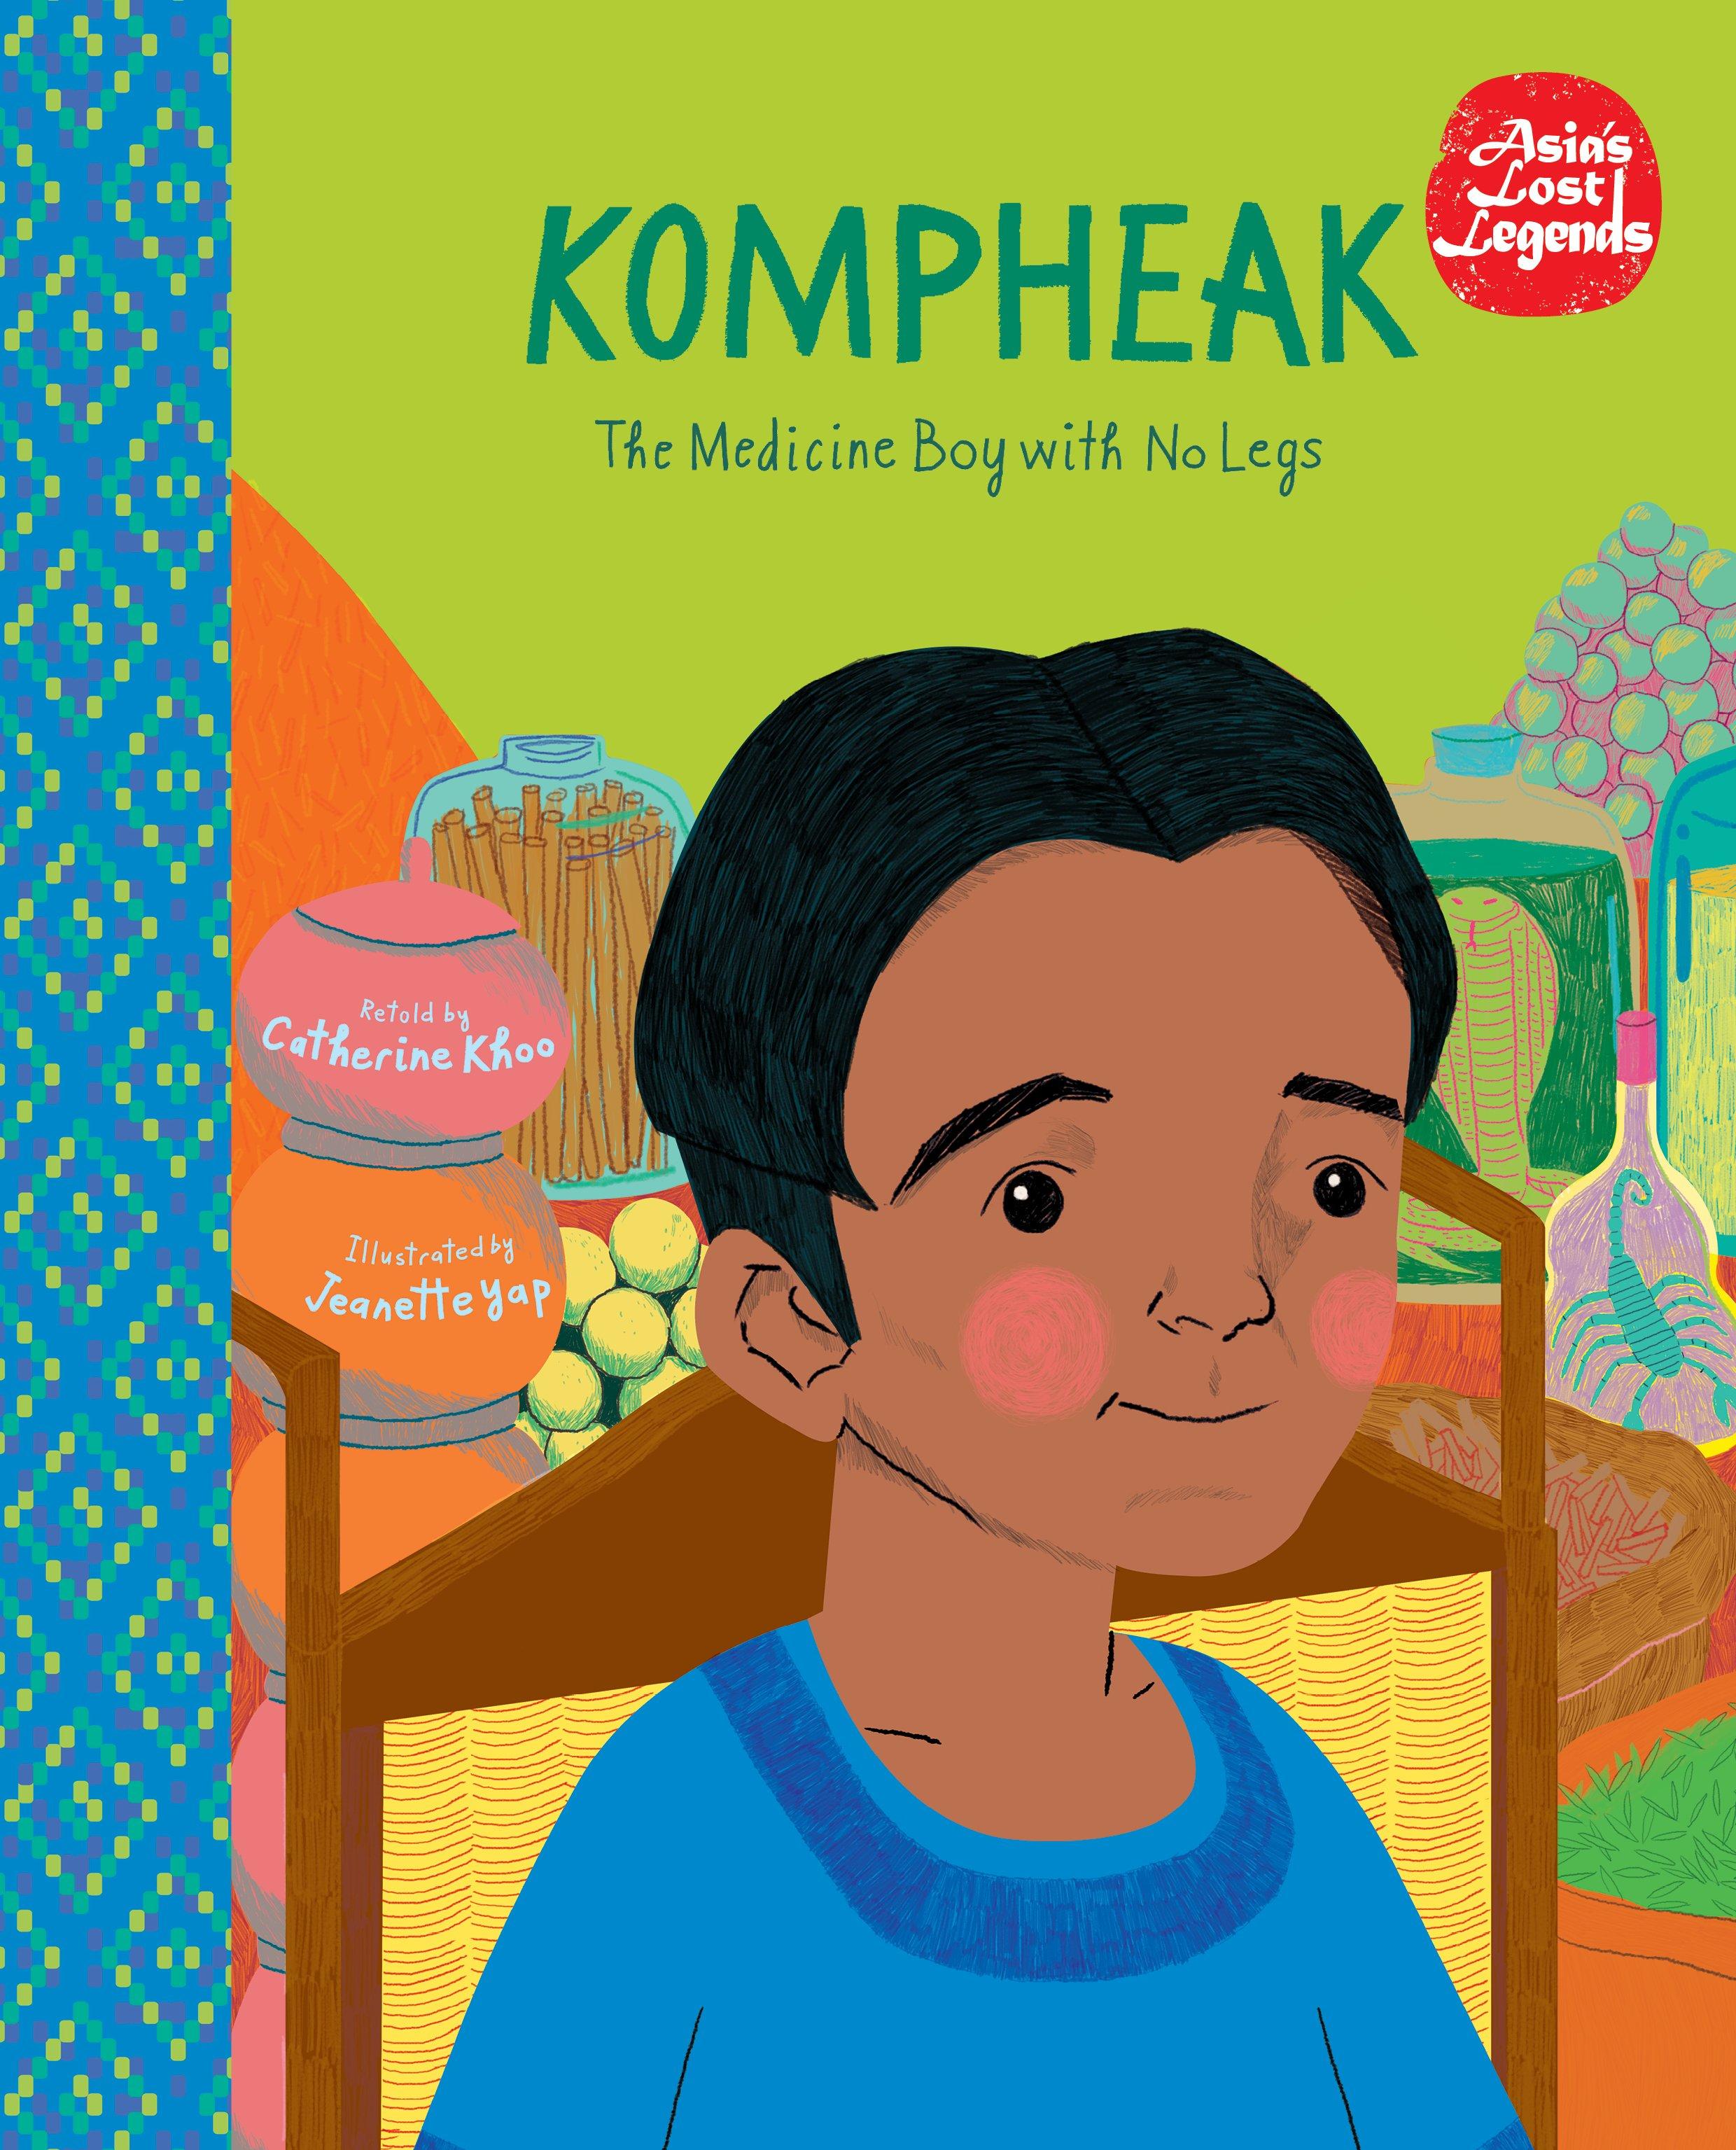 Kompheak: The Medicine Boy with No Legs